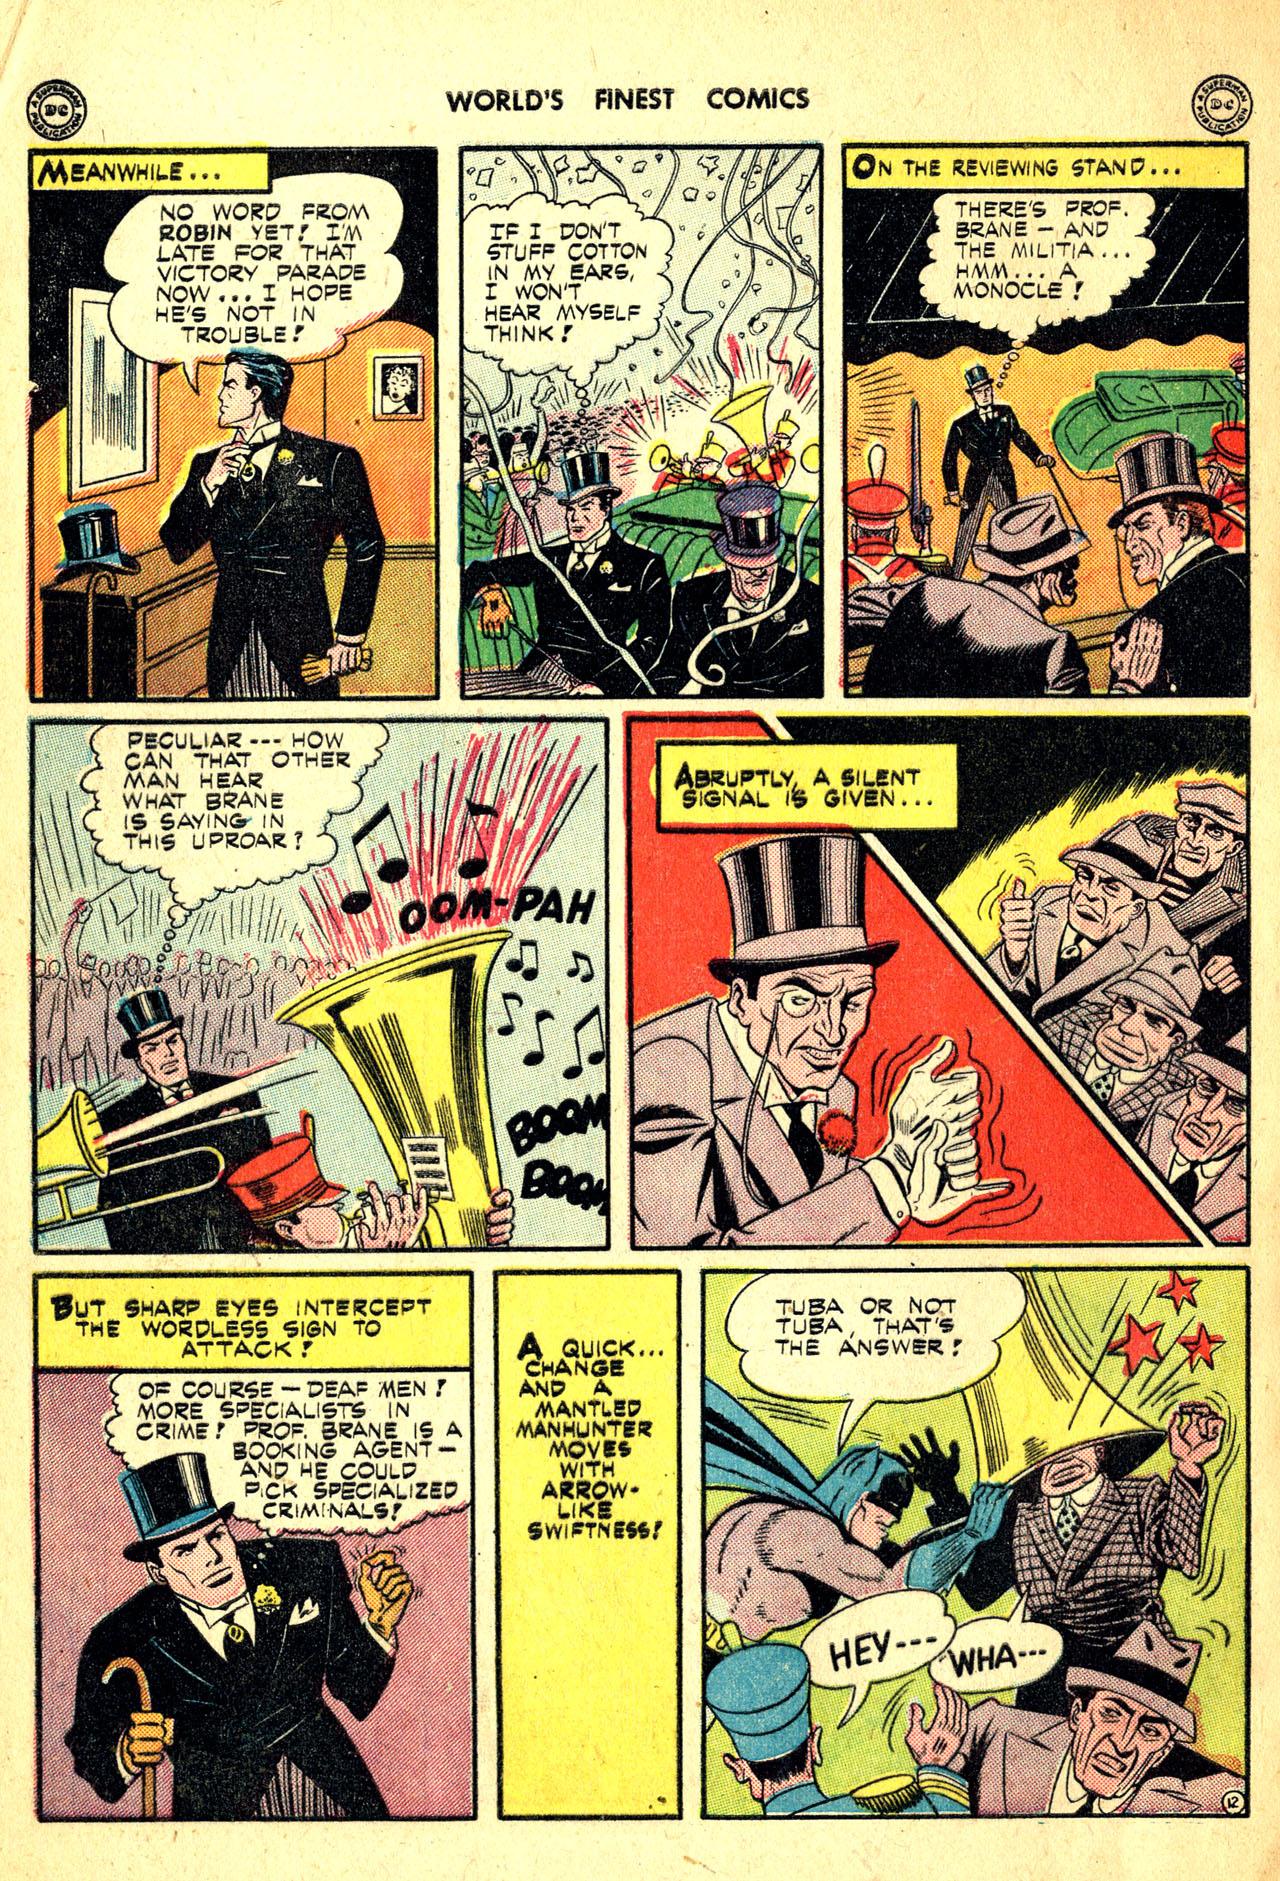 Read online World's Finest Comics comic -  Issue #18 - 80